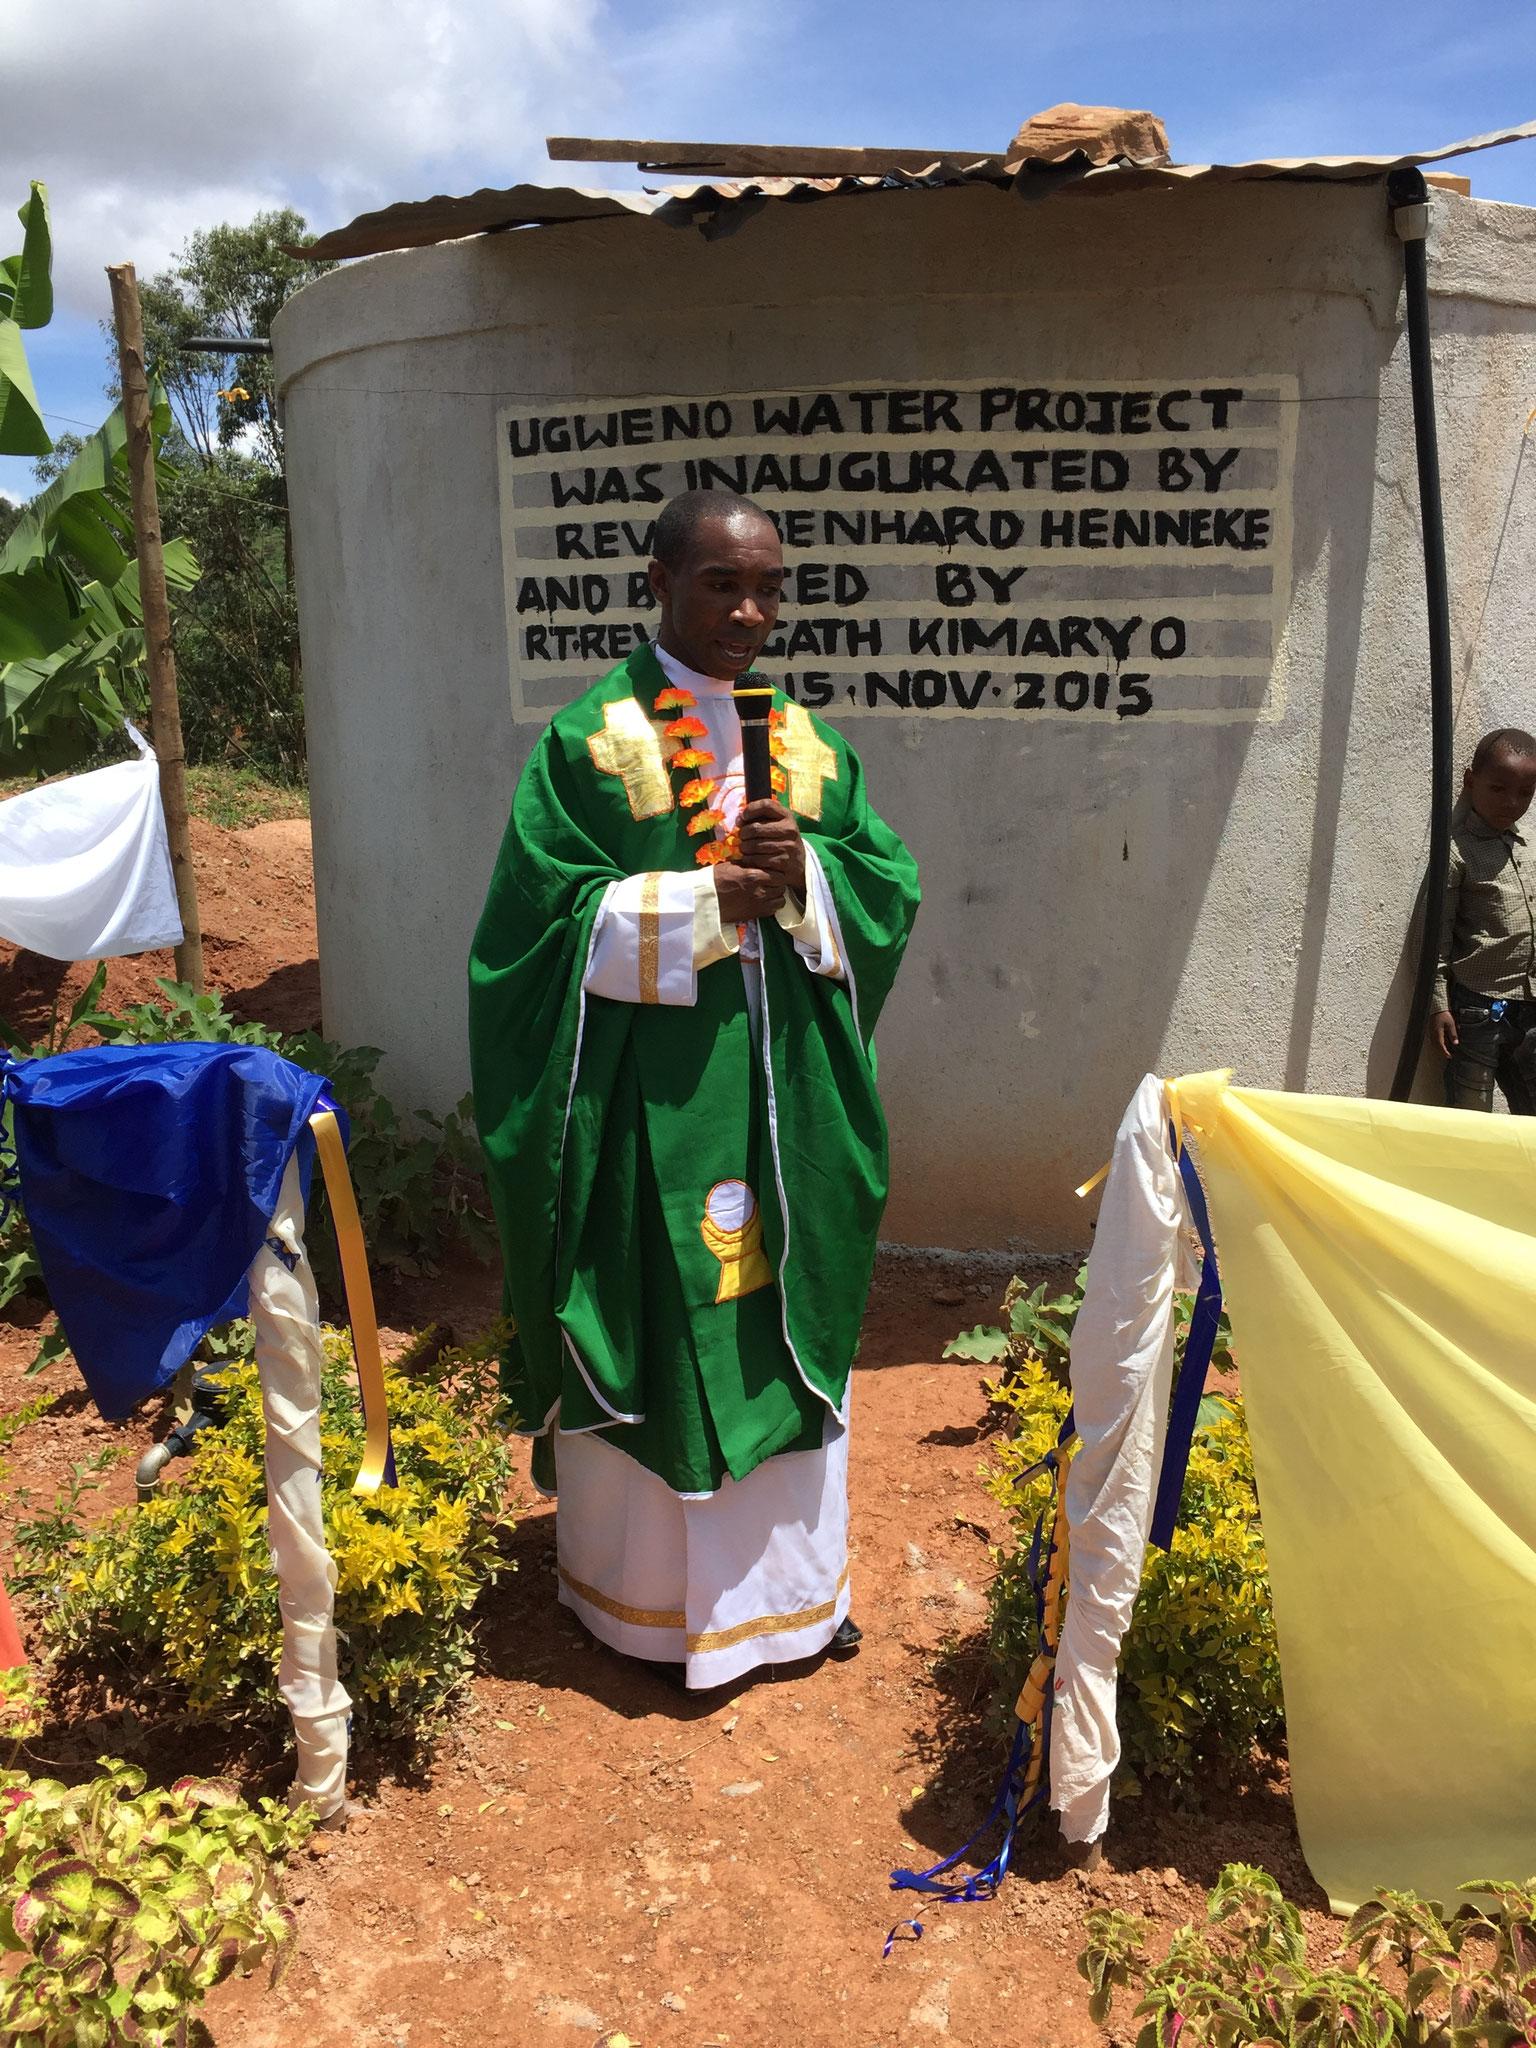 Father Mathias, der Pfarrer vor Ort